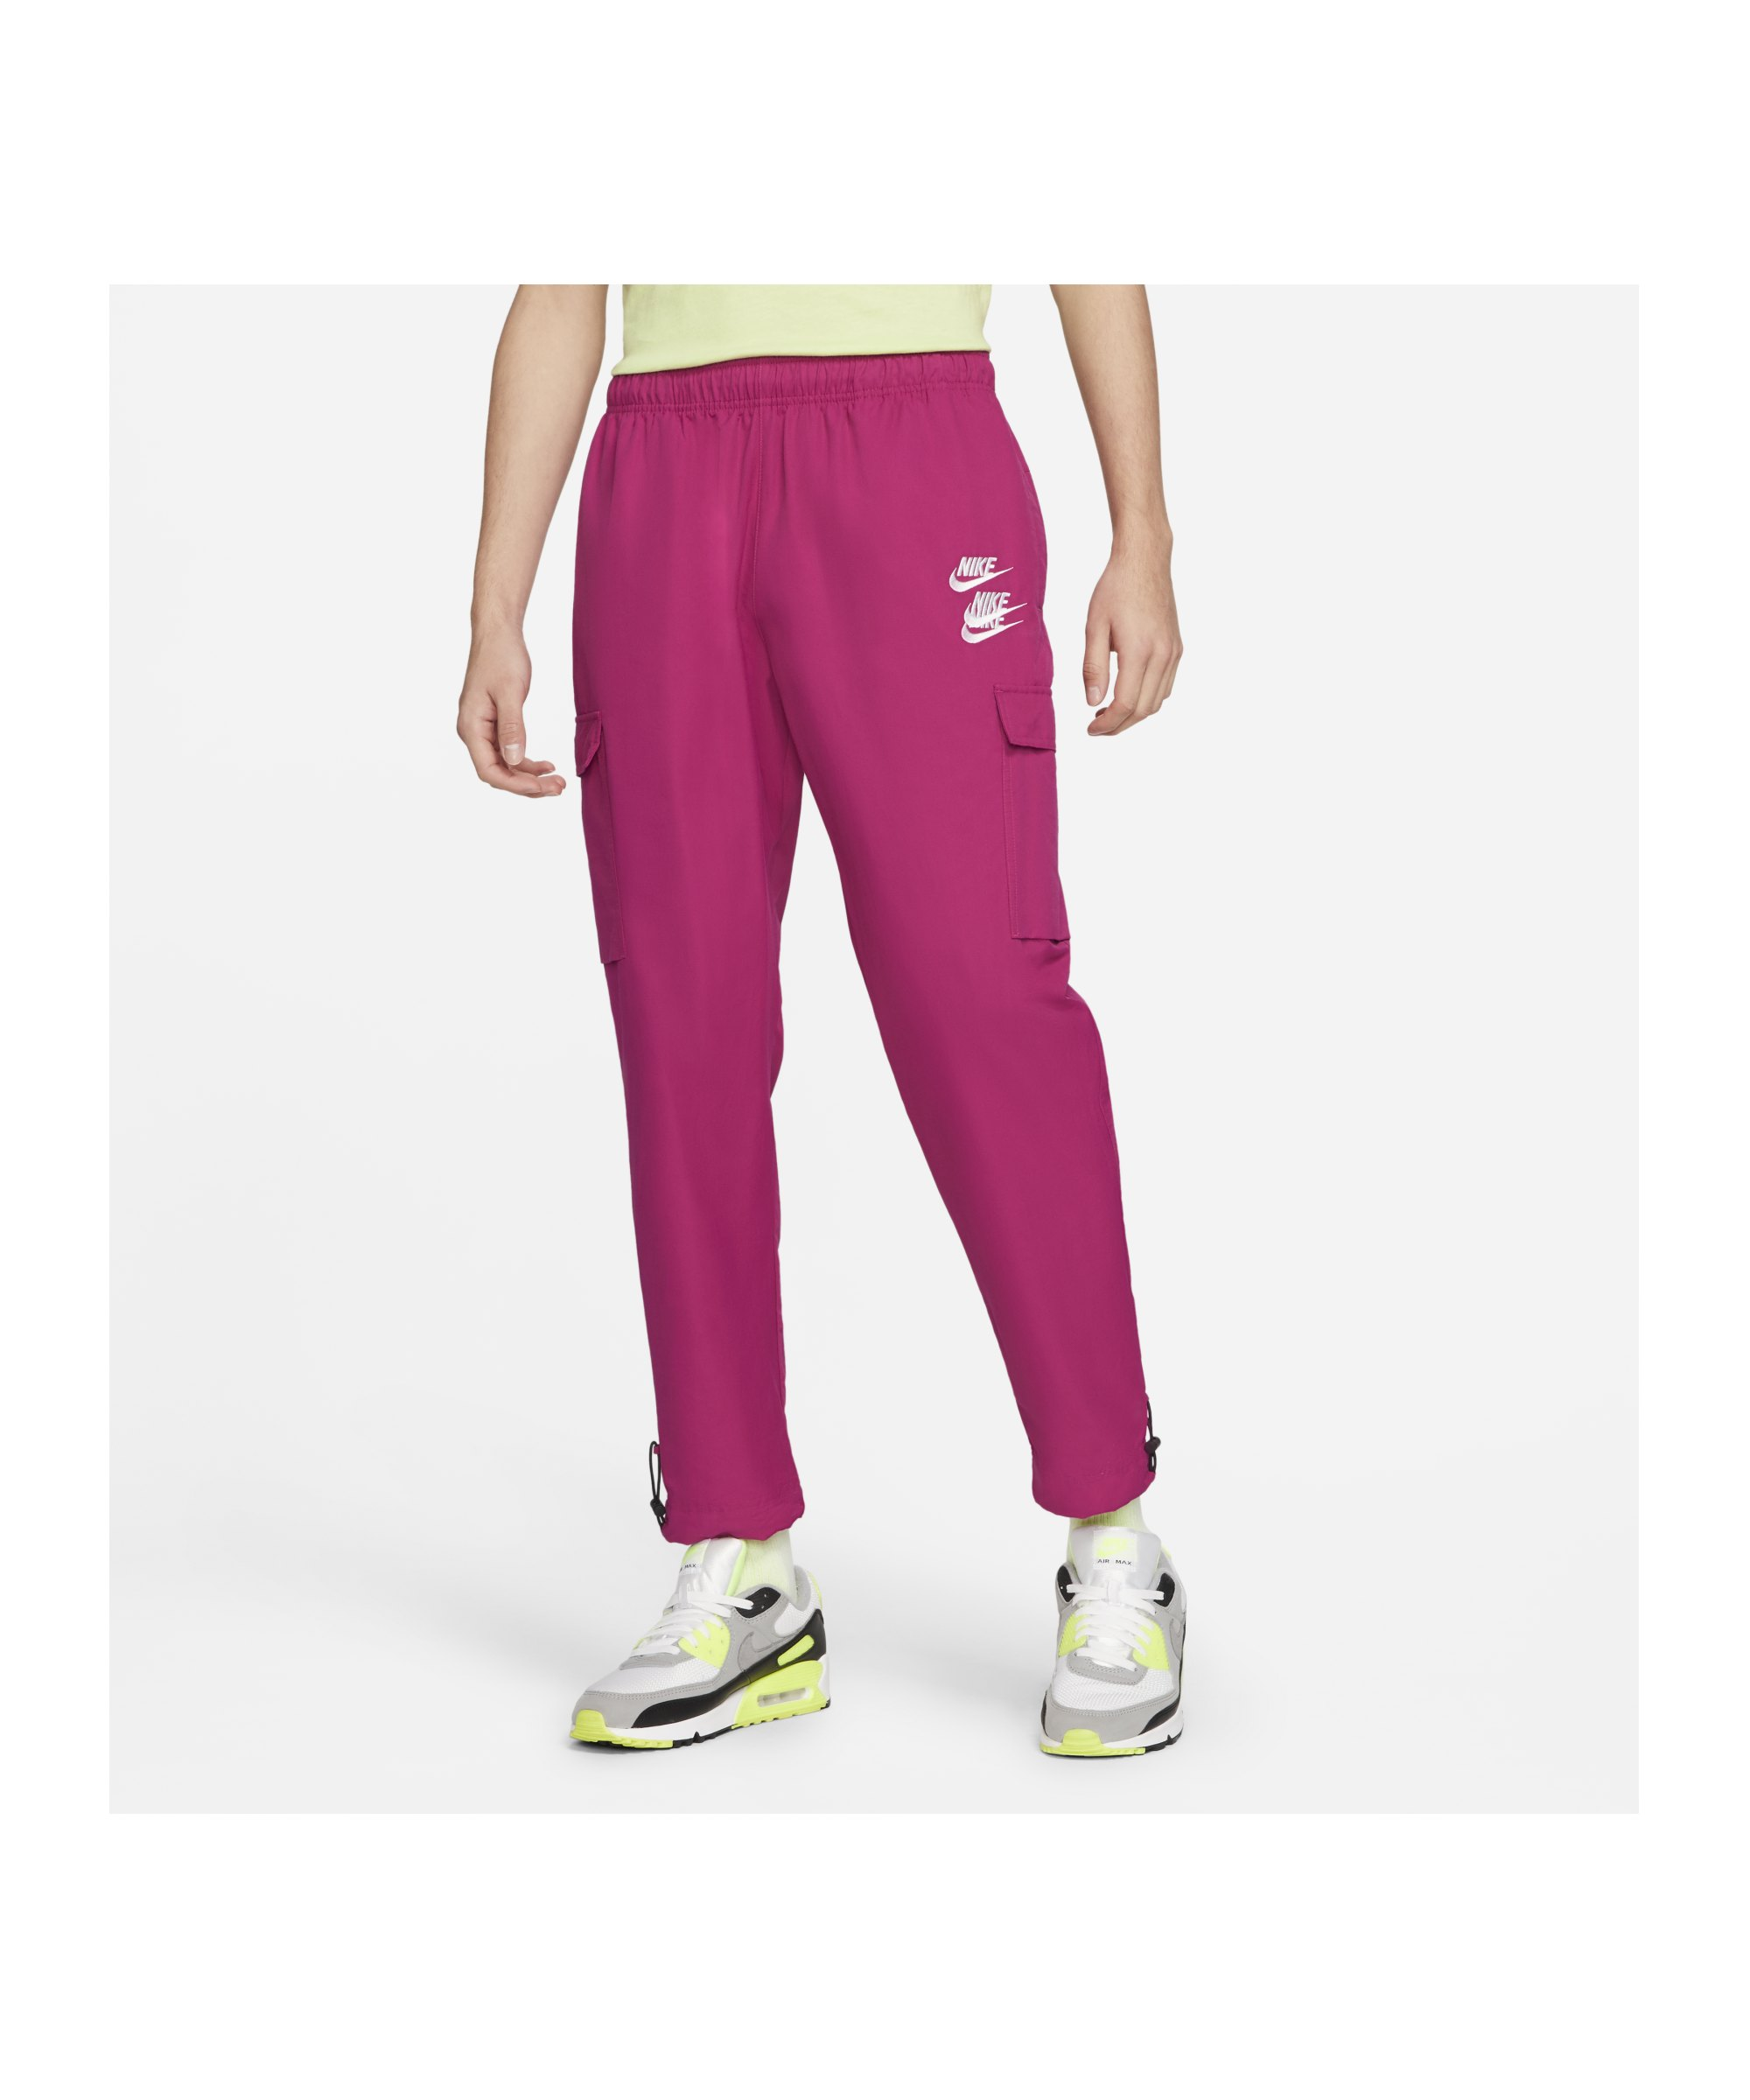 Nike Woven Cargo Jogginghose Pink F615 - pink